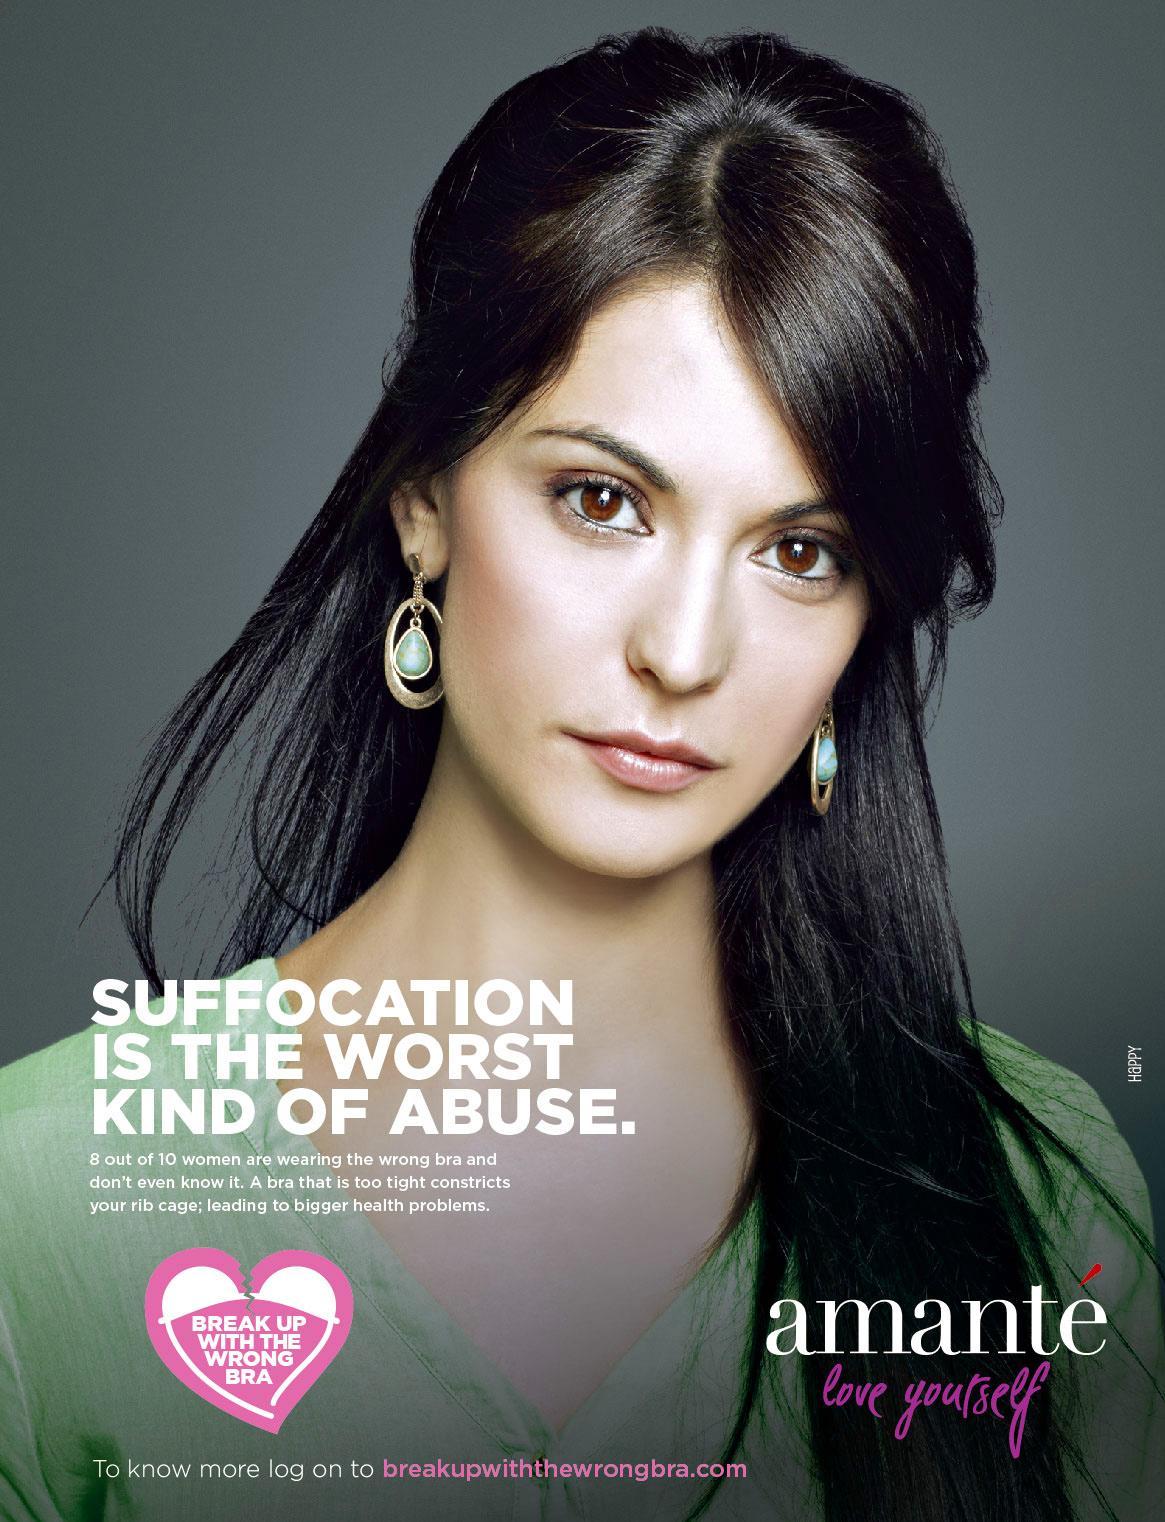 Amanté Print Ad -  Break up the wrong bra, 5